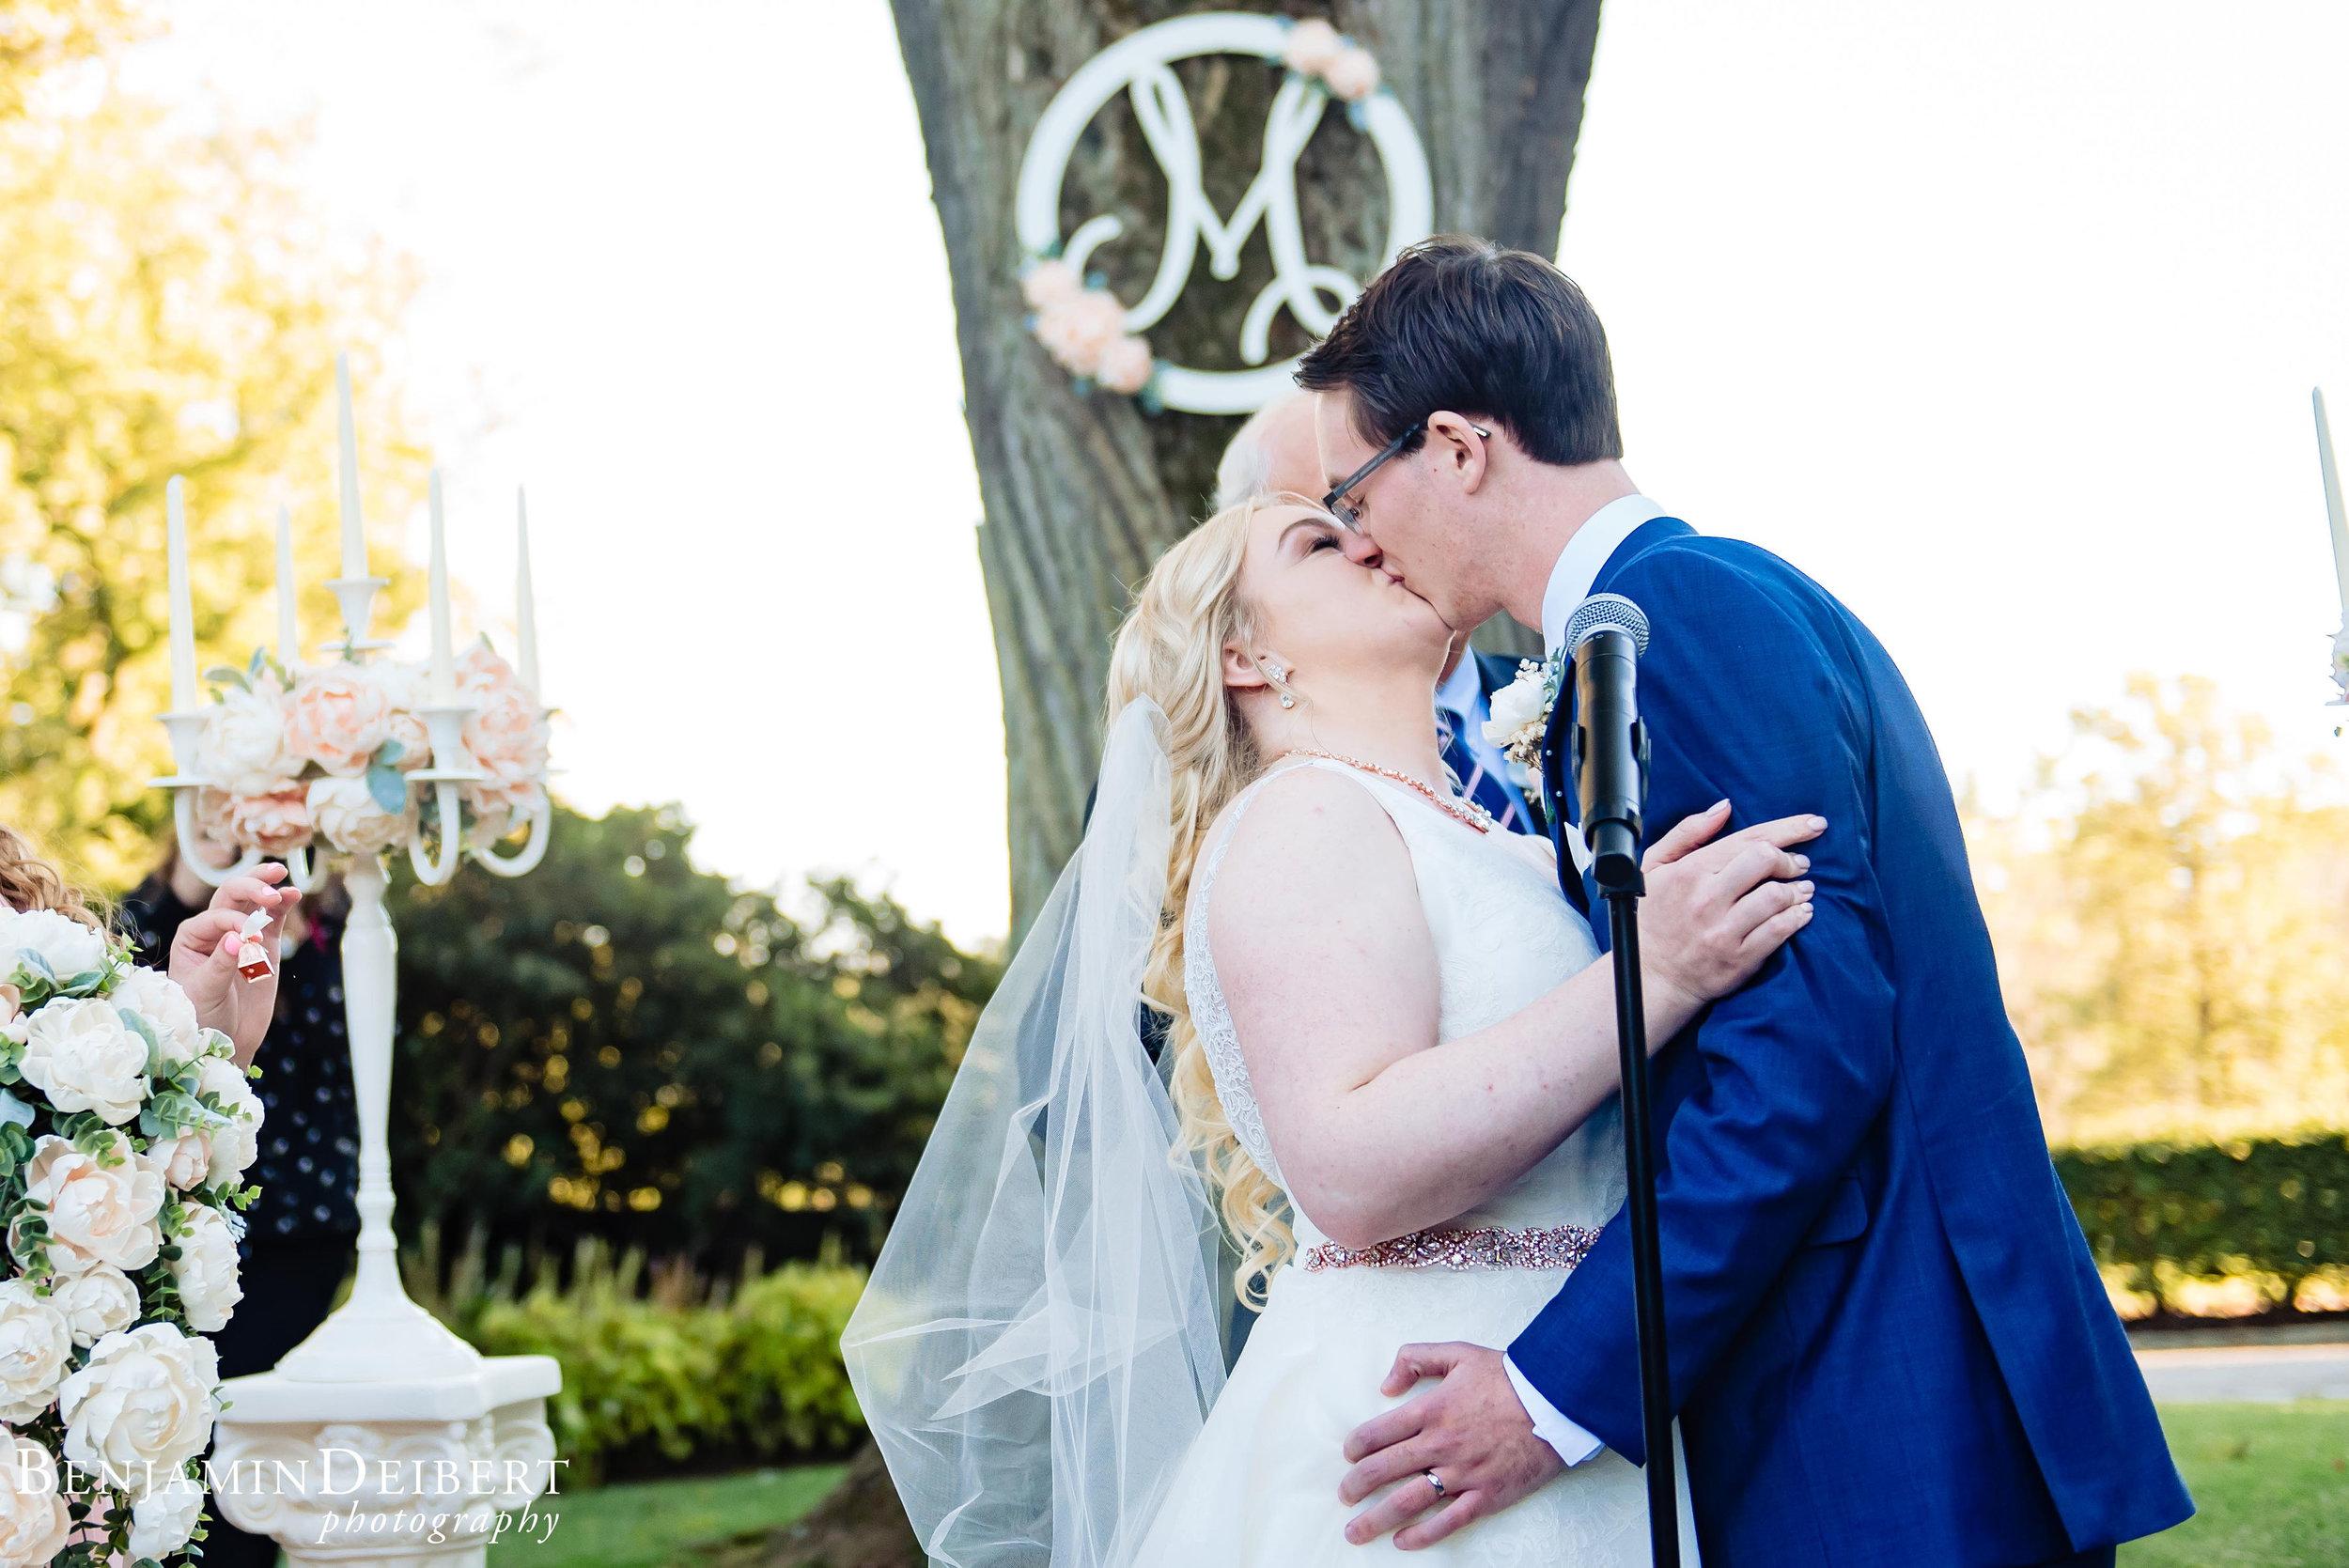 AshleyandDerrick_RadnorValleyCountryClub_Wedding-48.jpg